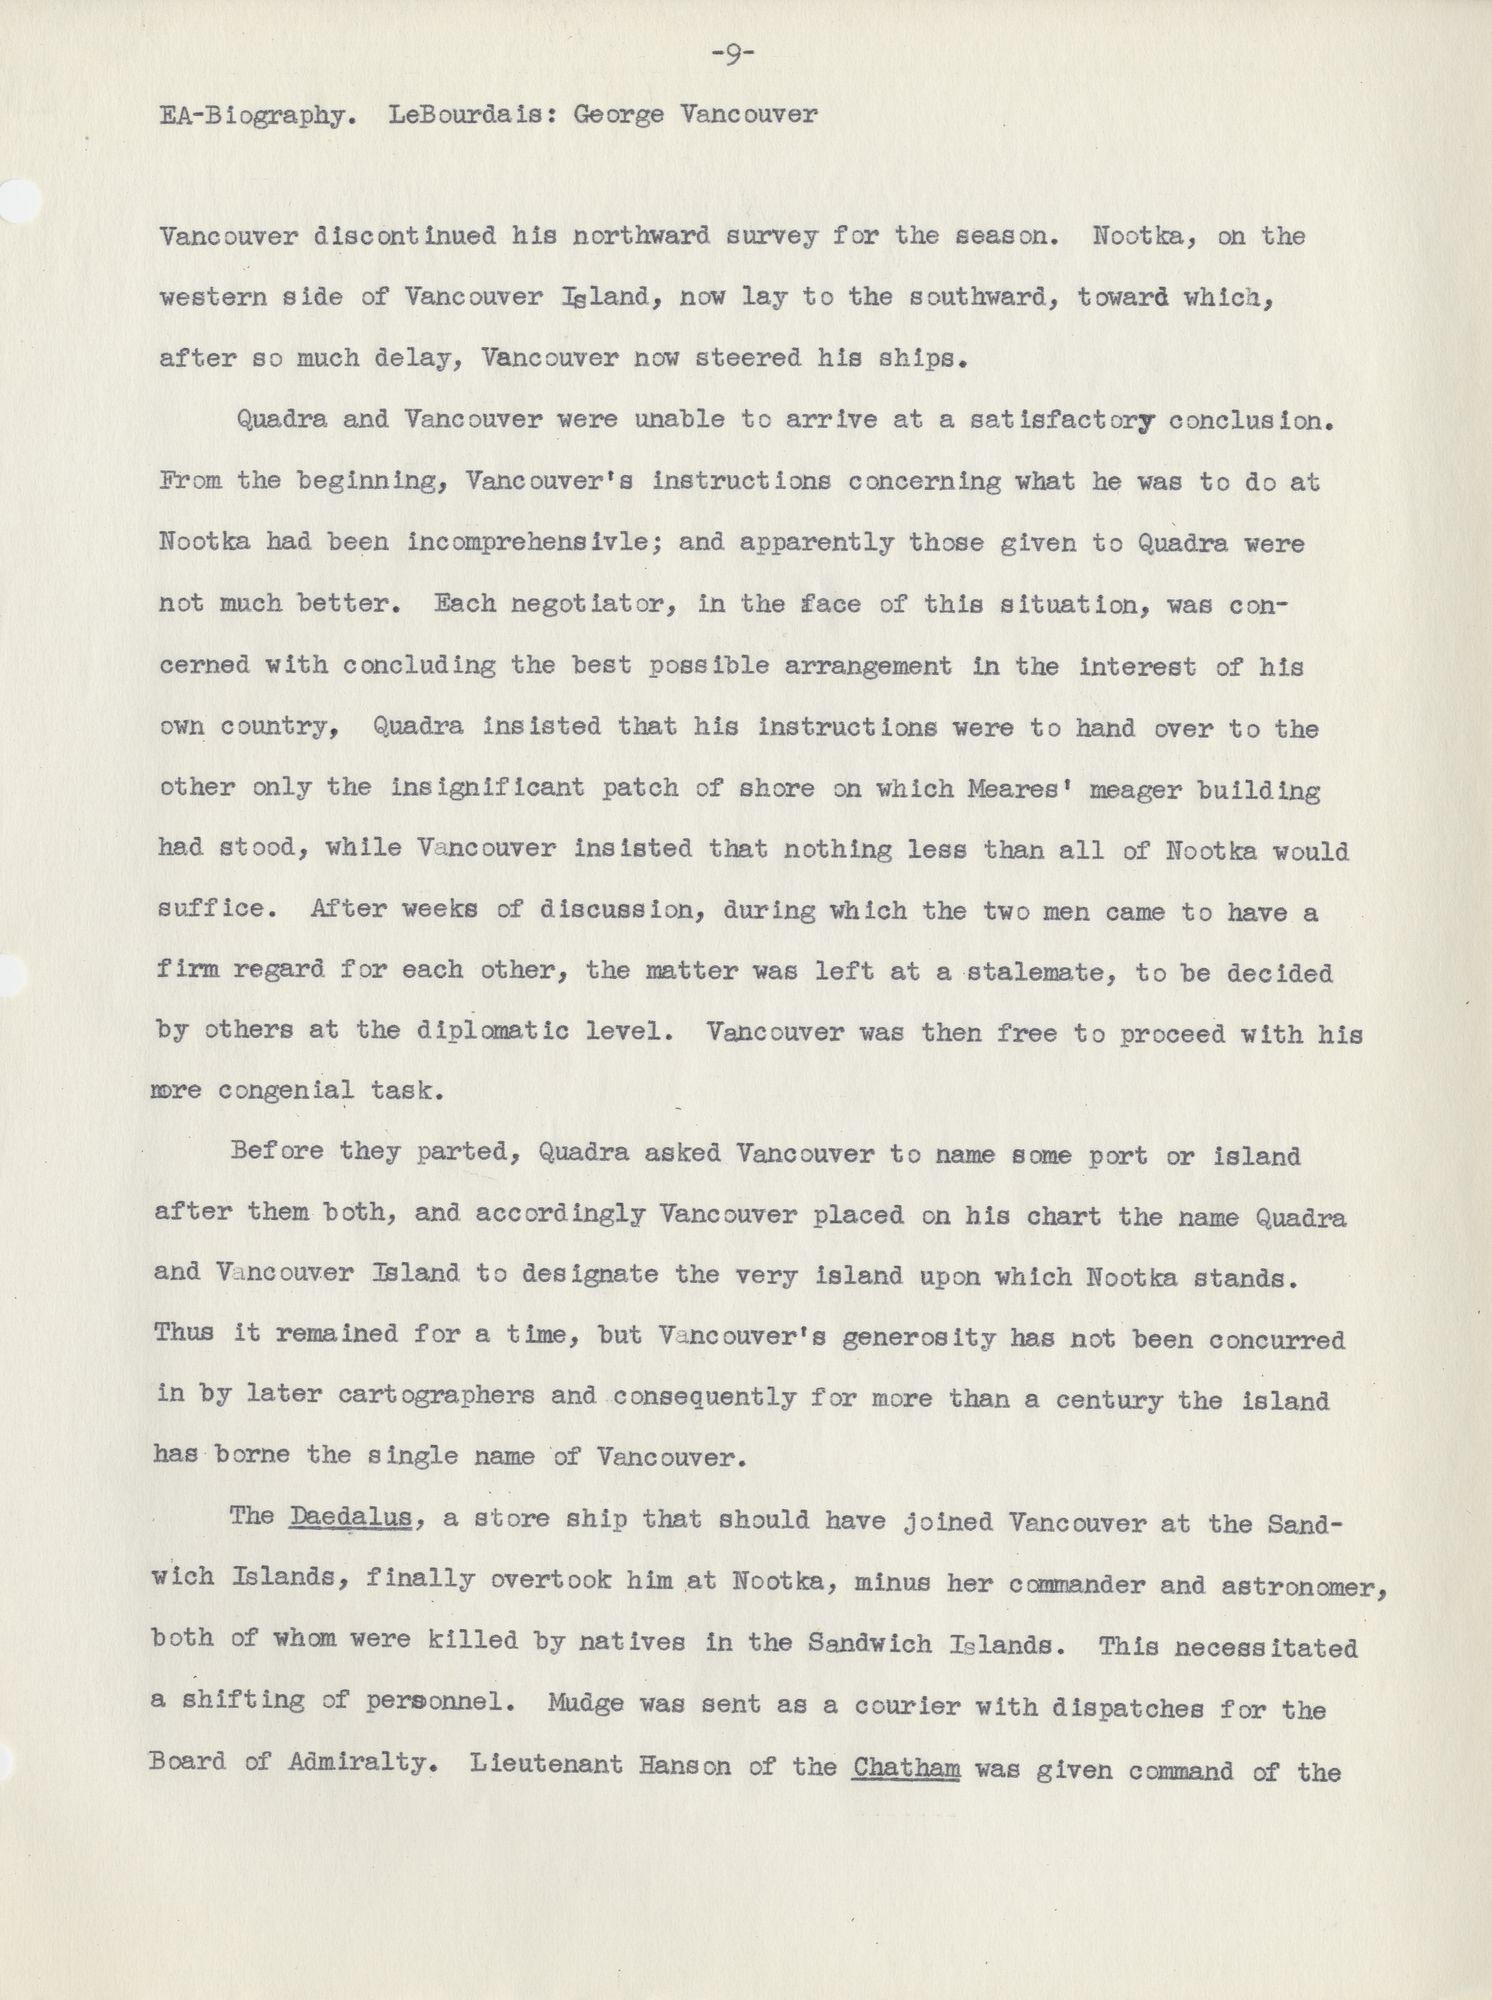 George Vancouver Encyclopedia Arctica 15 Biographies